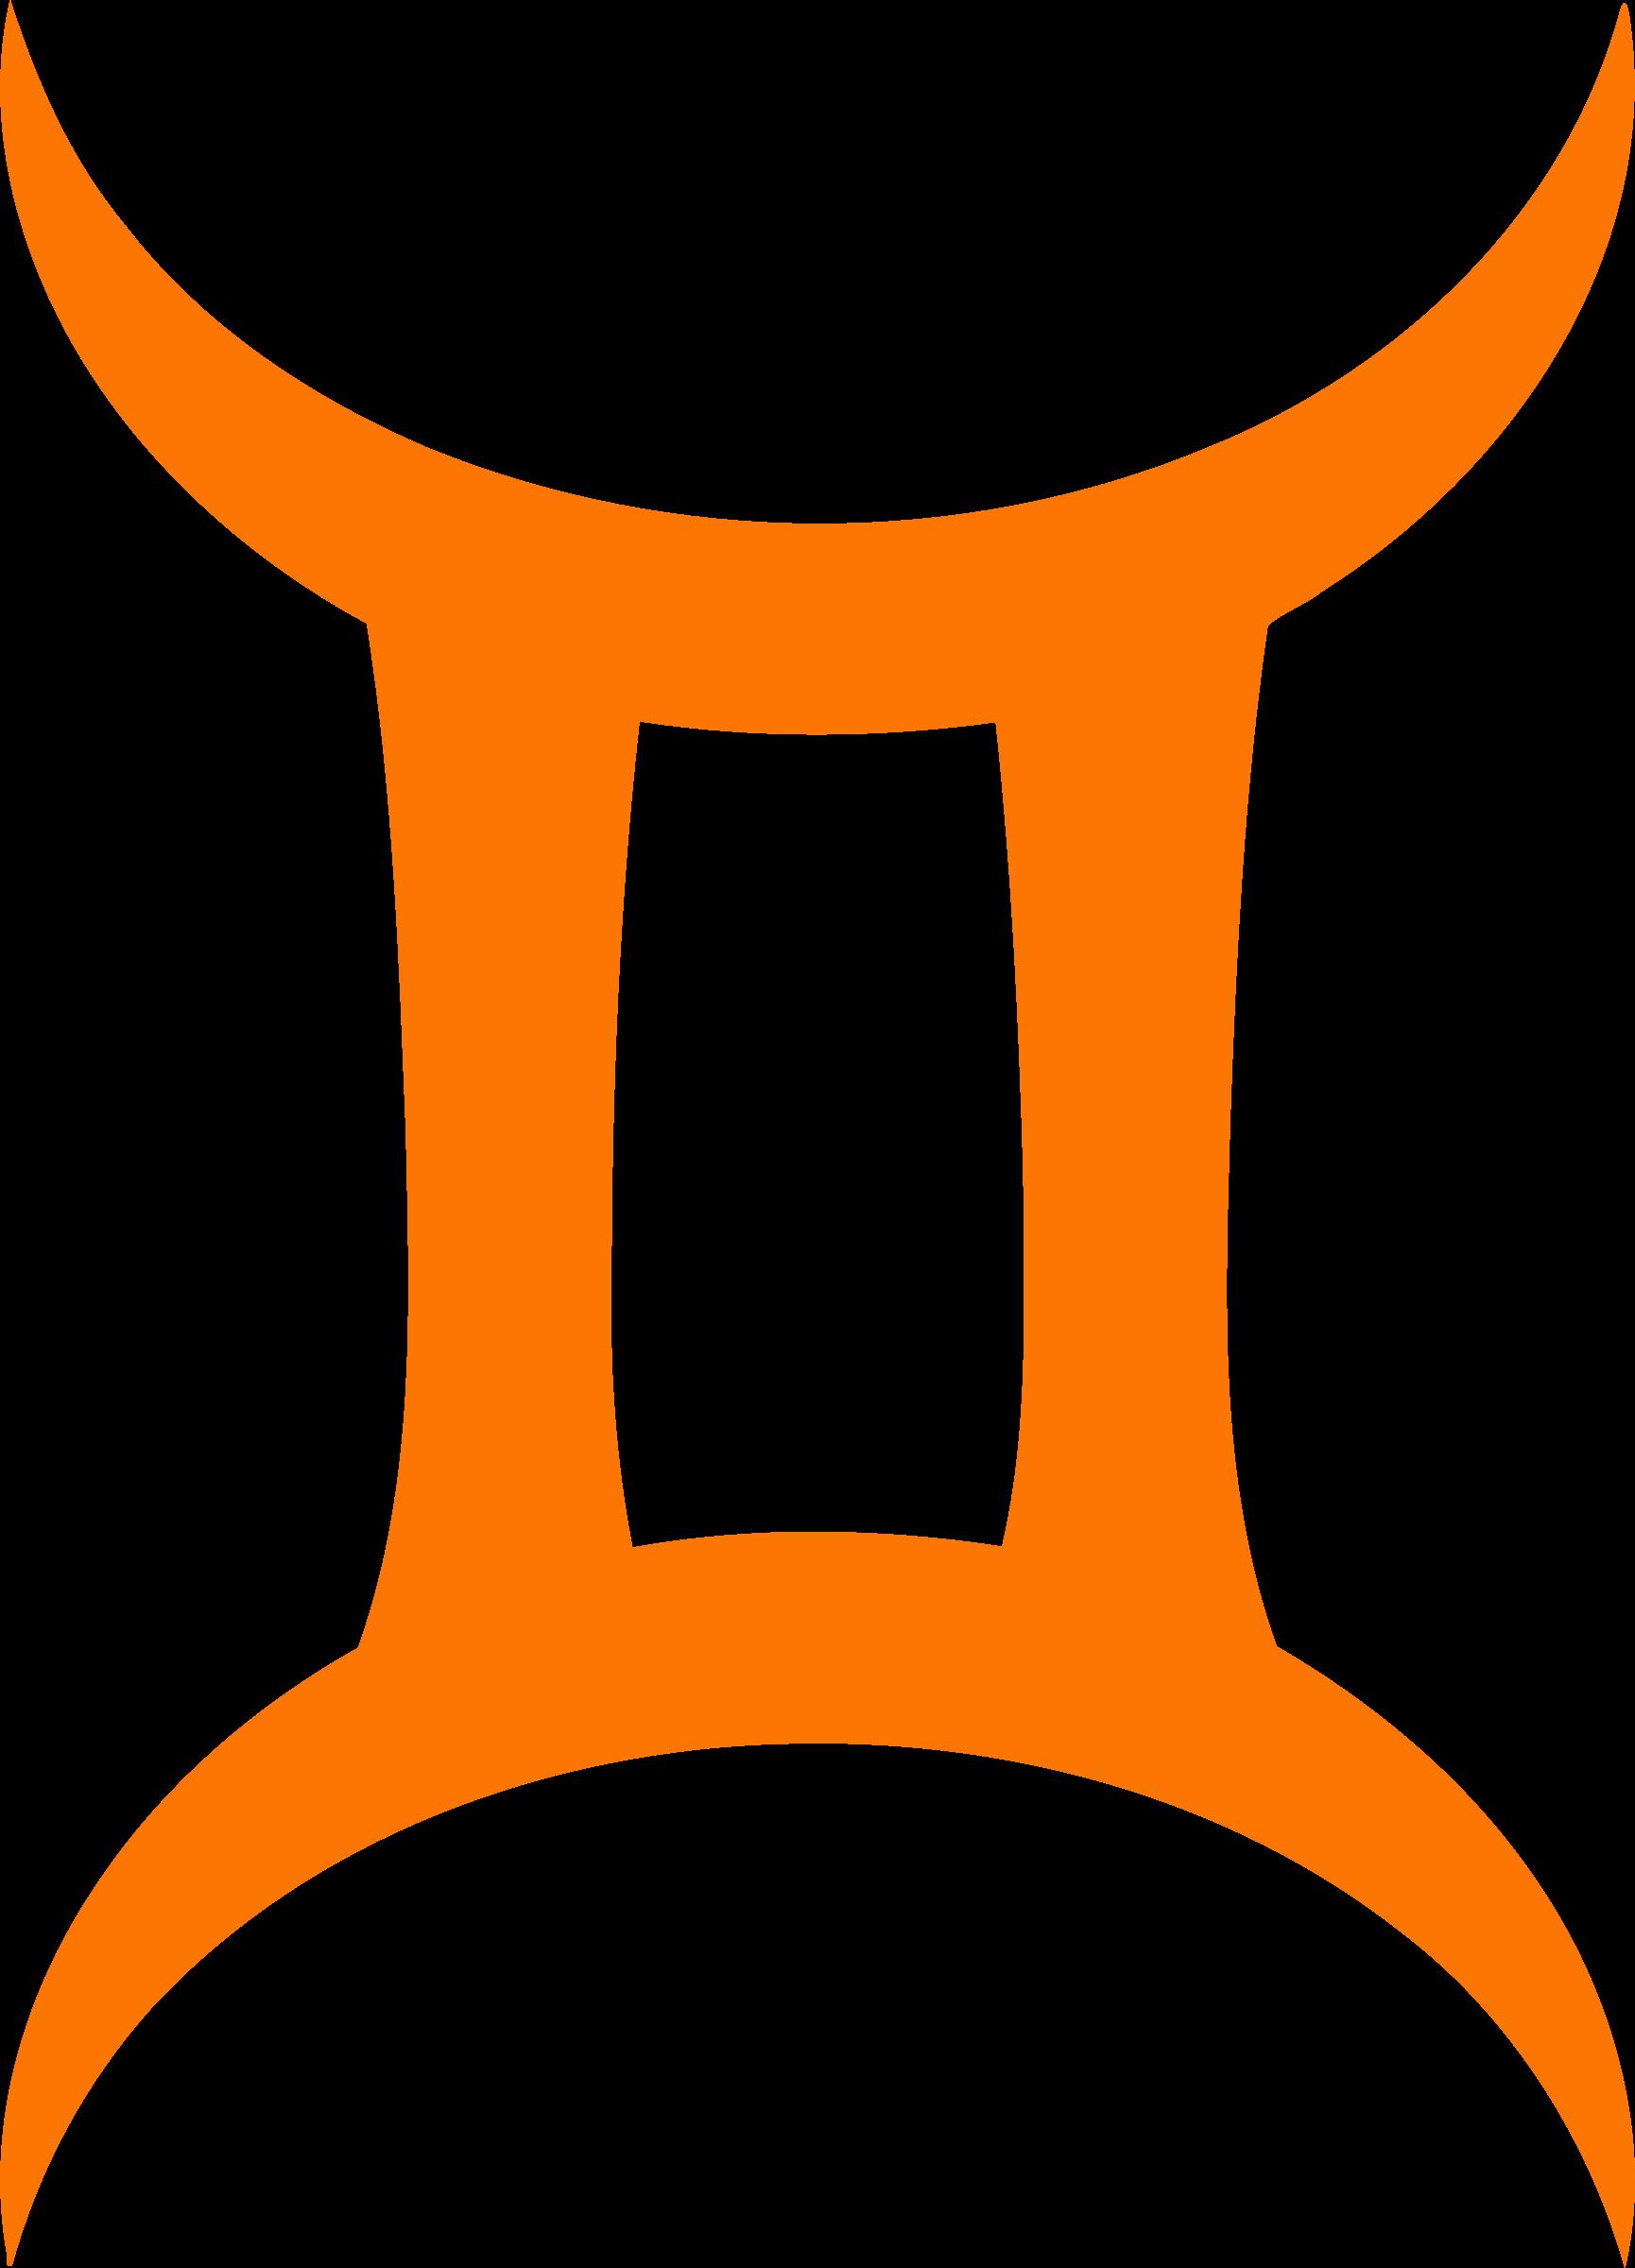 gemini symbol wwwpixsharkcom images galleries with a